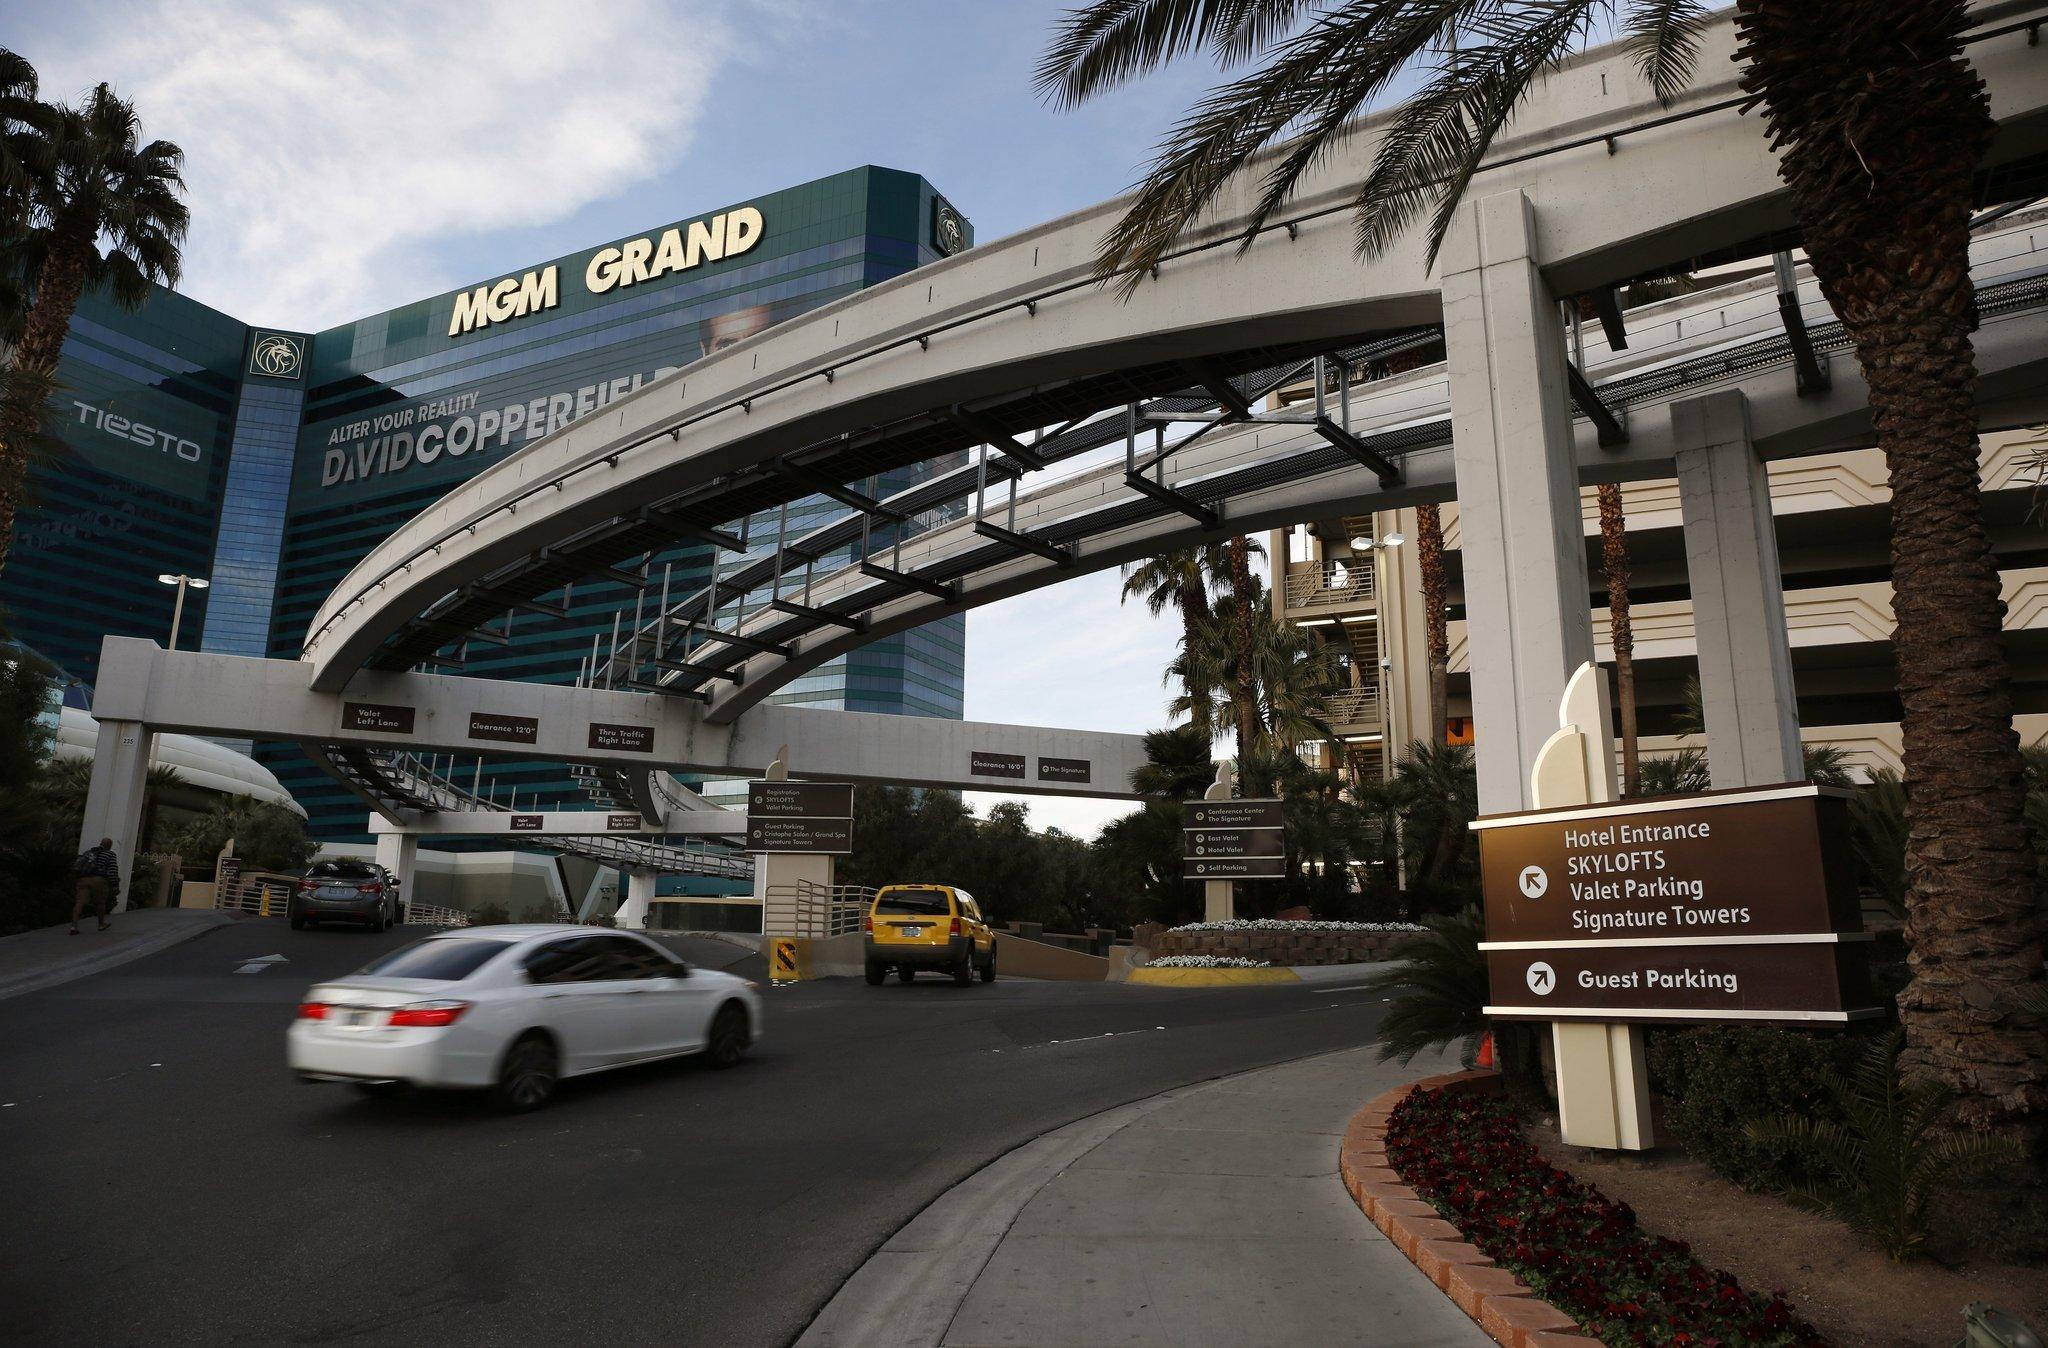 Parking Star City Casino